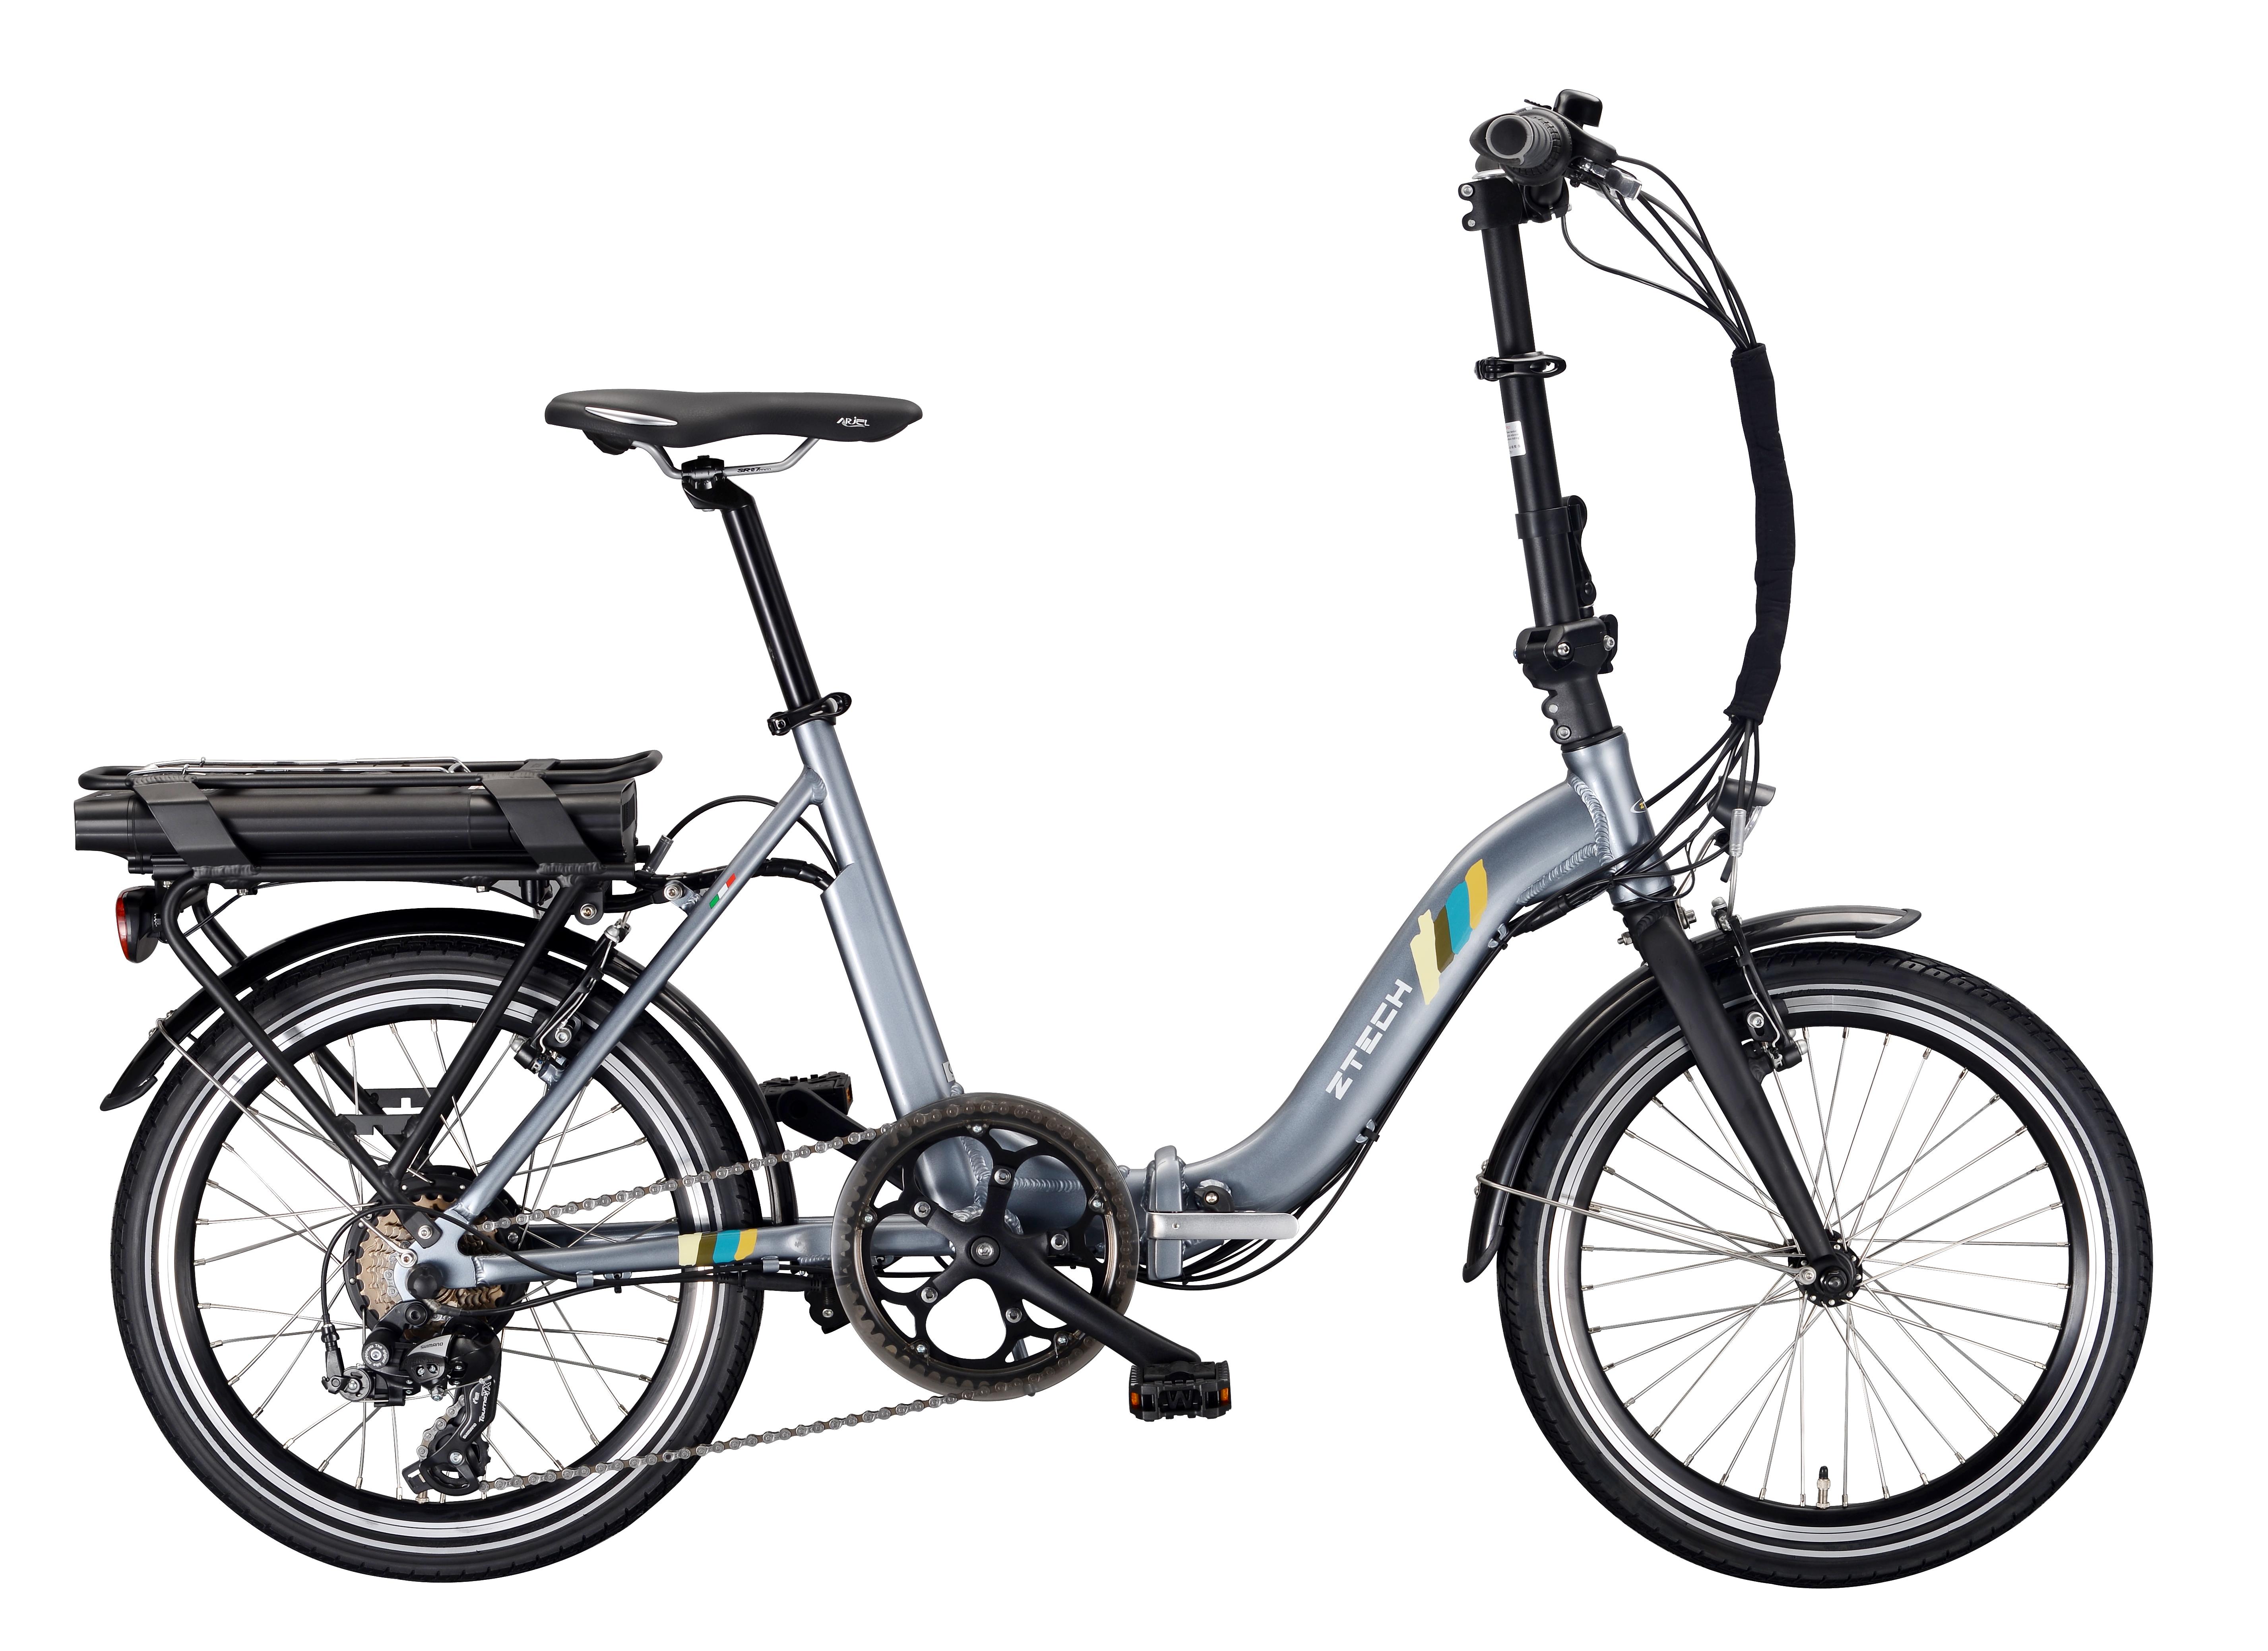 Bicicleta electrica pliabila Ztech ZT-71 Urban